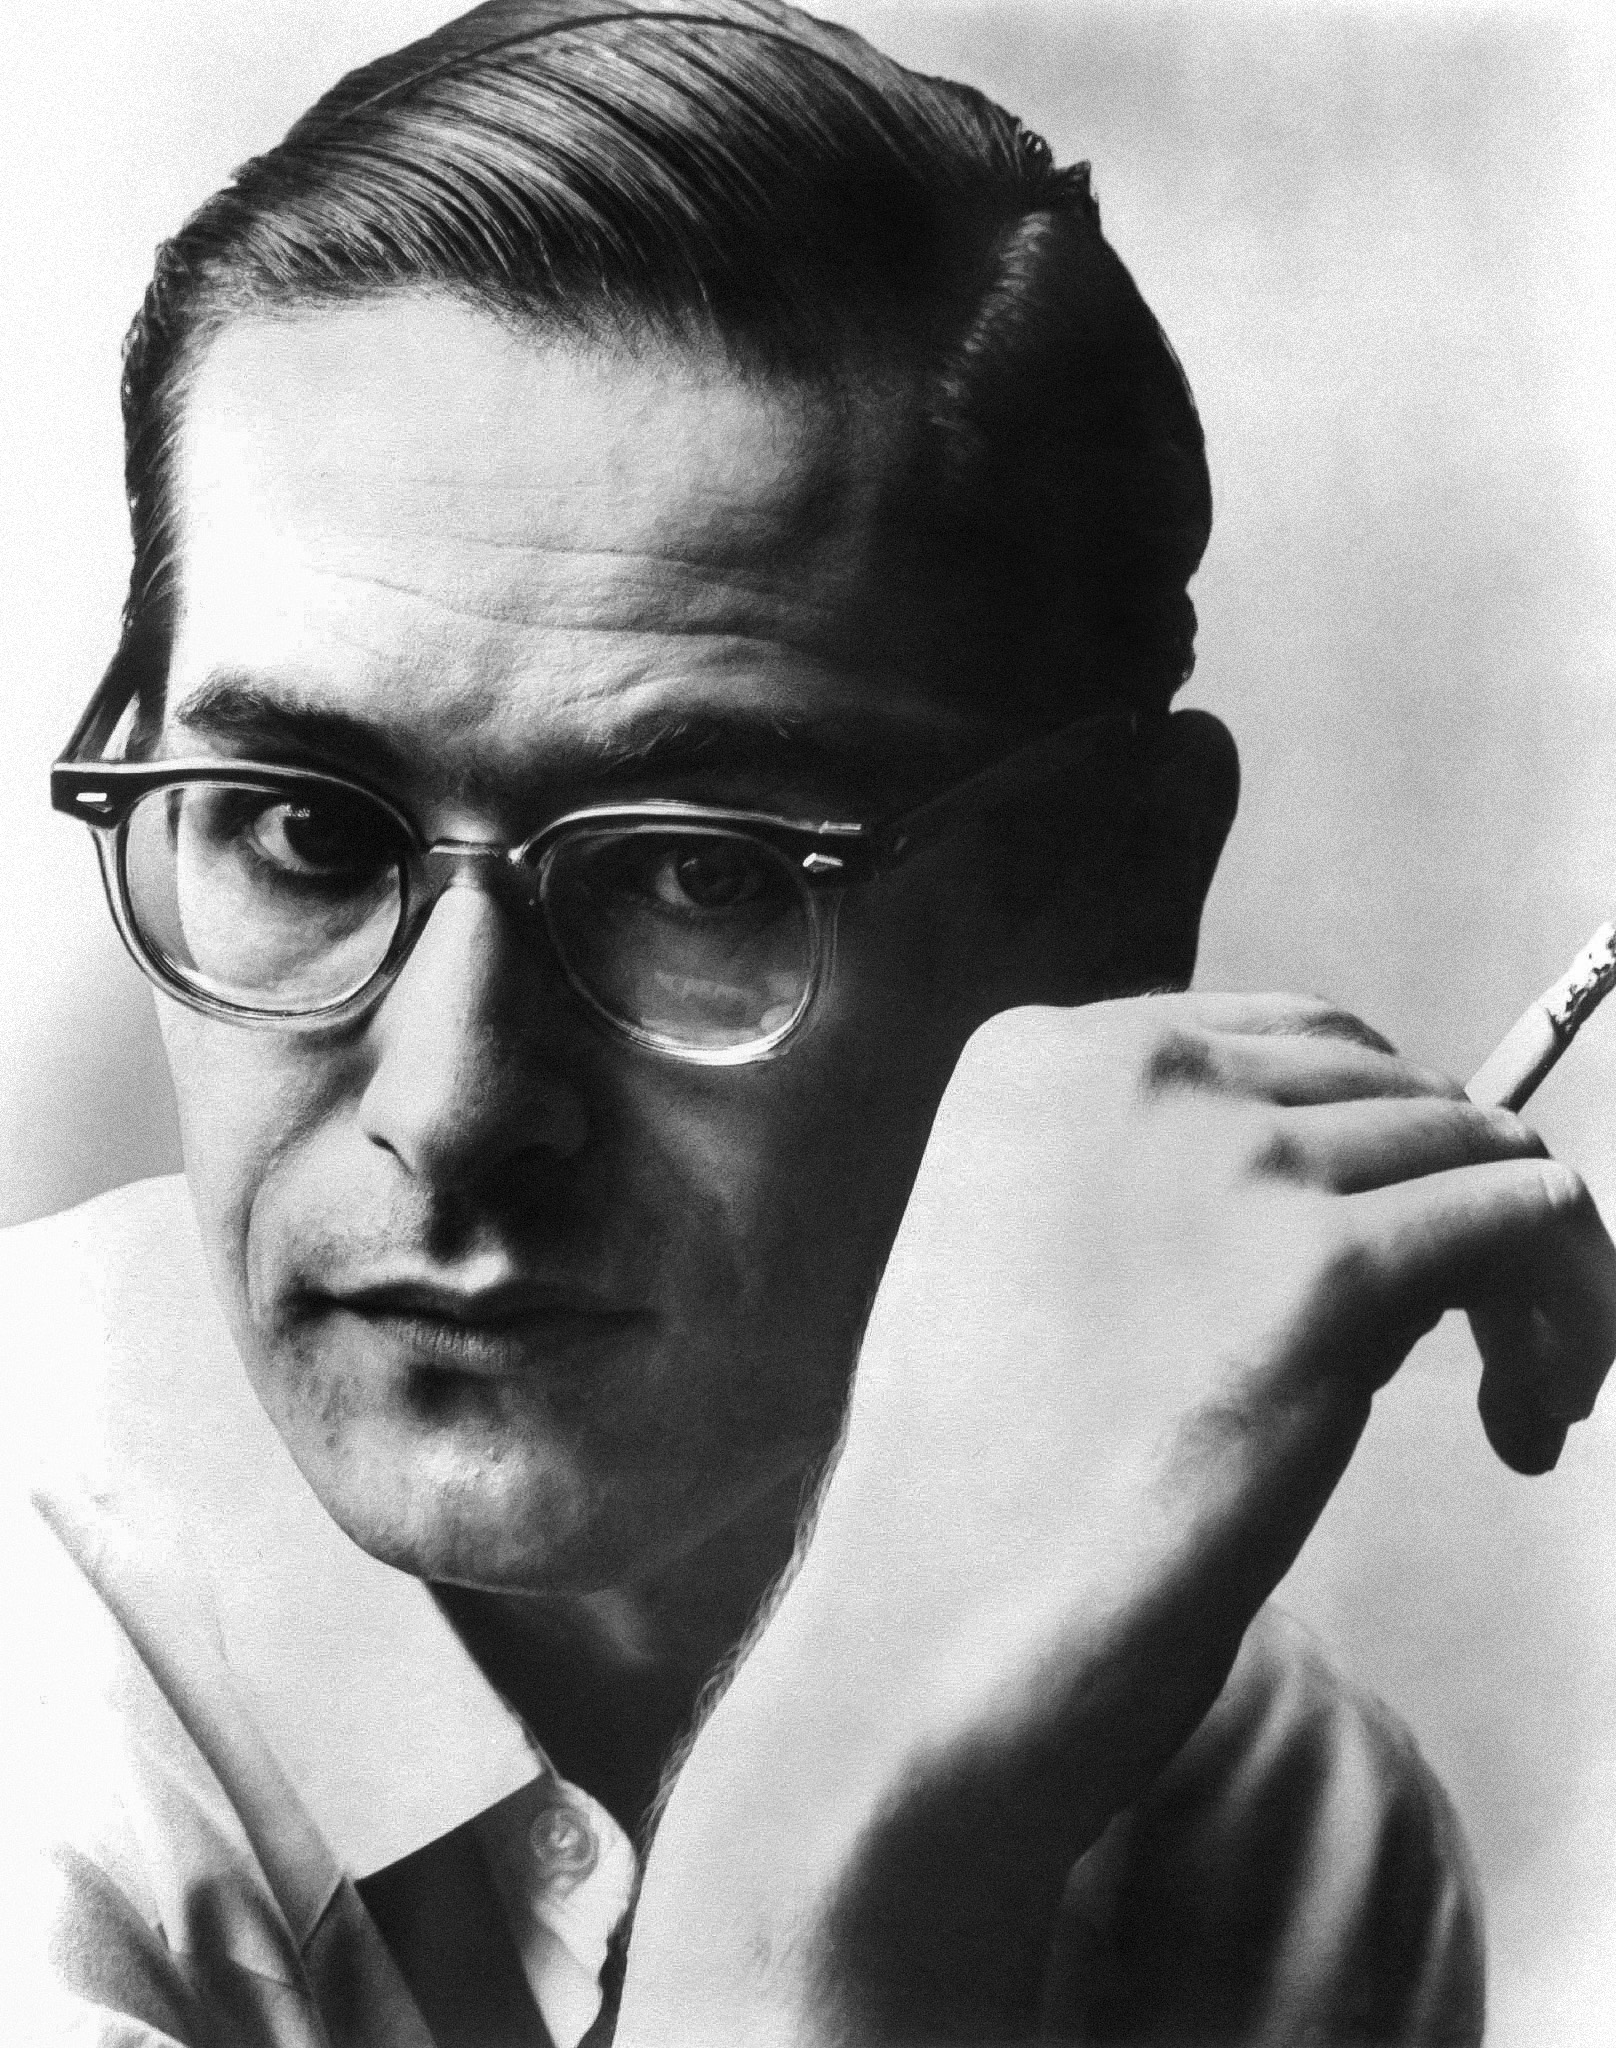 Evans in 1961